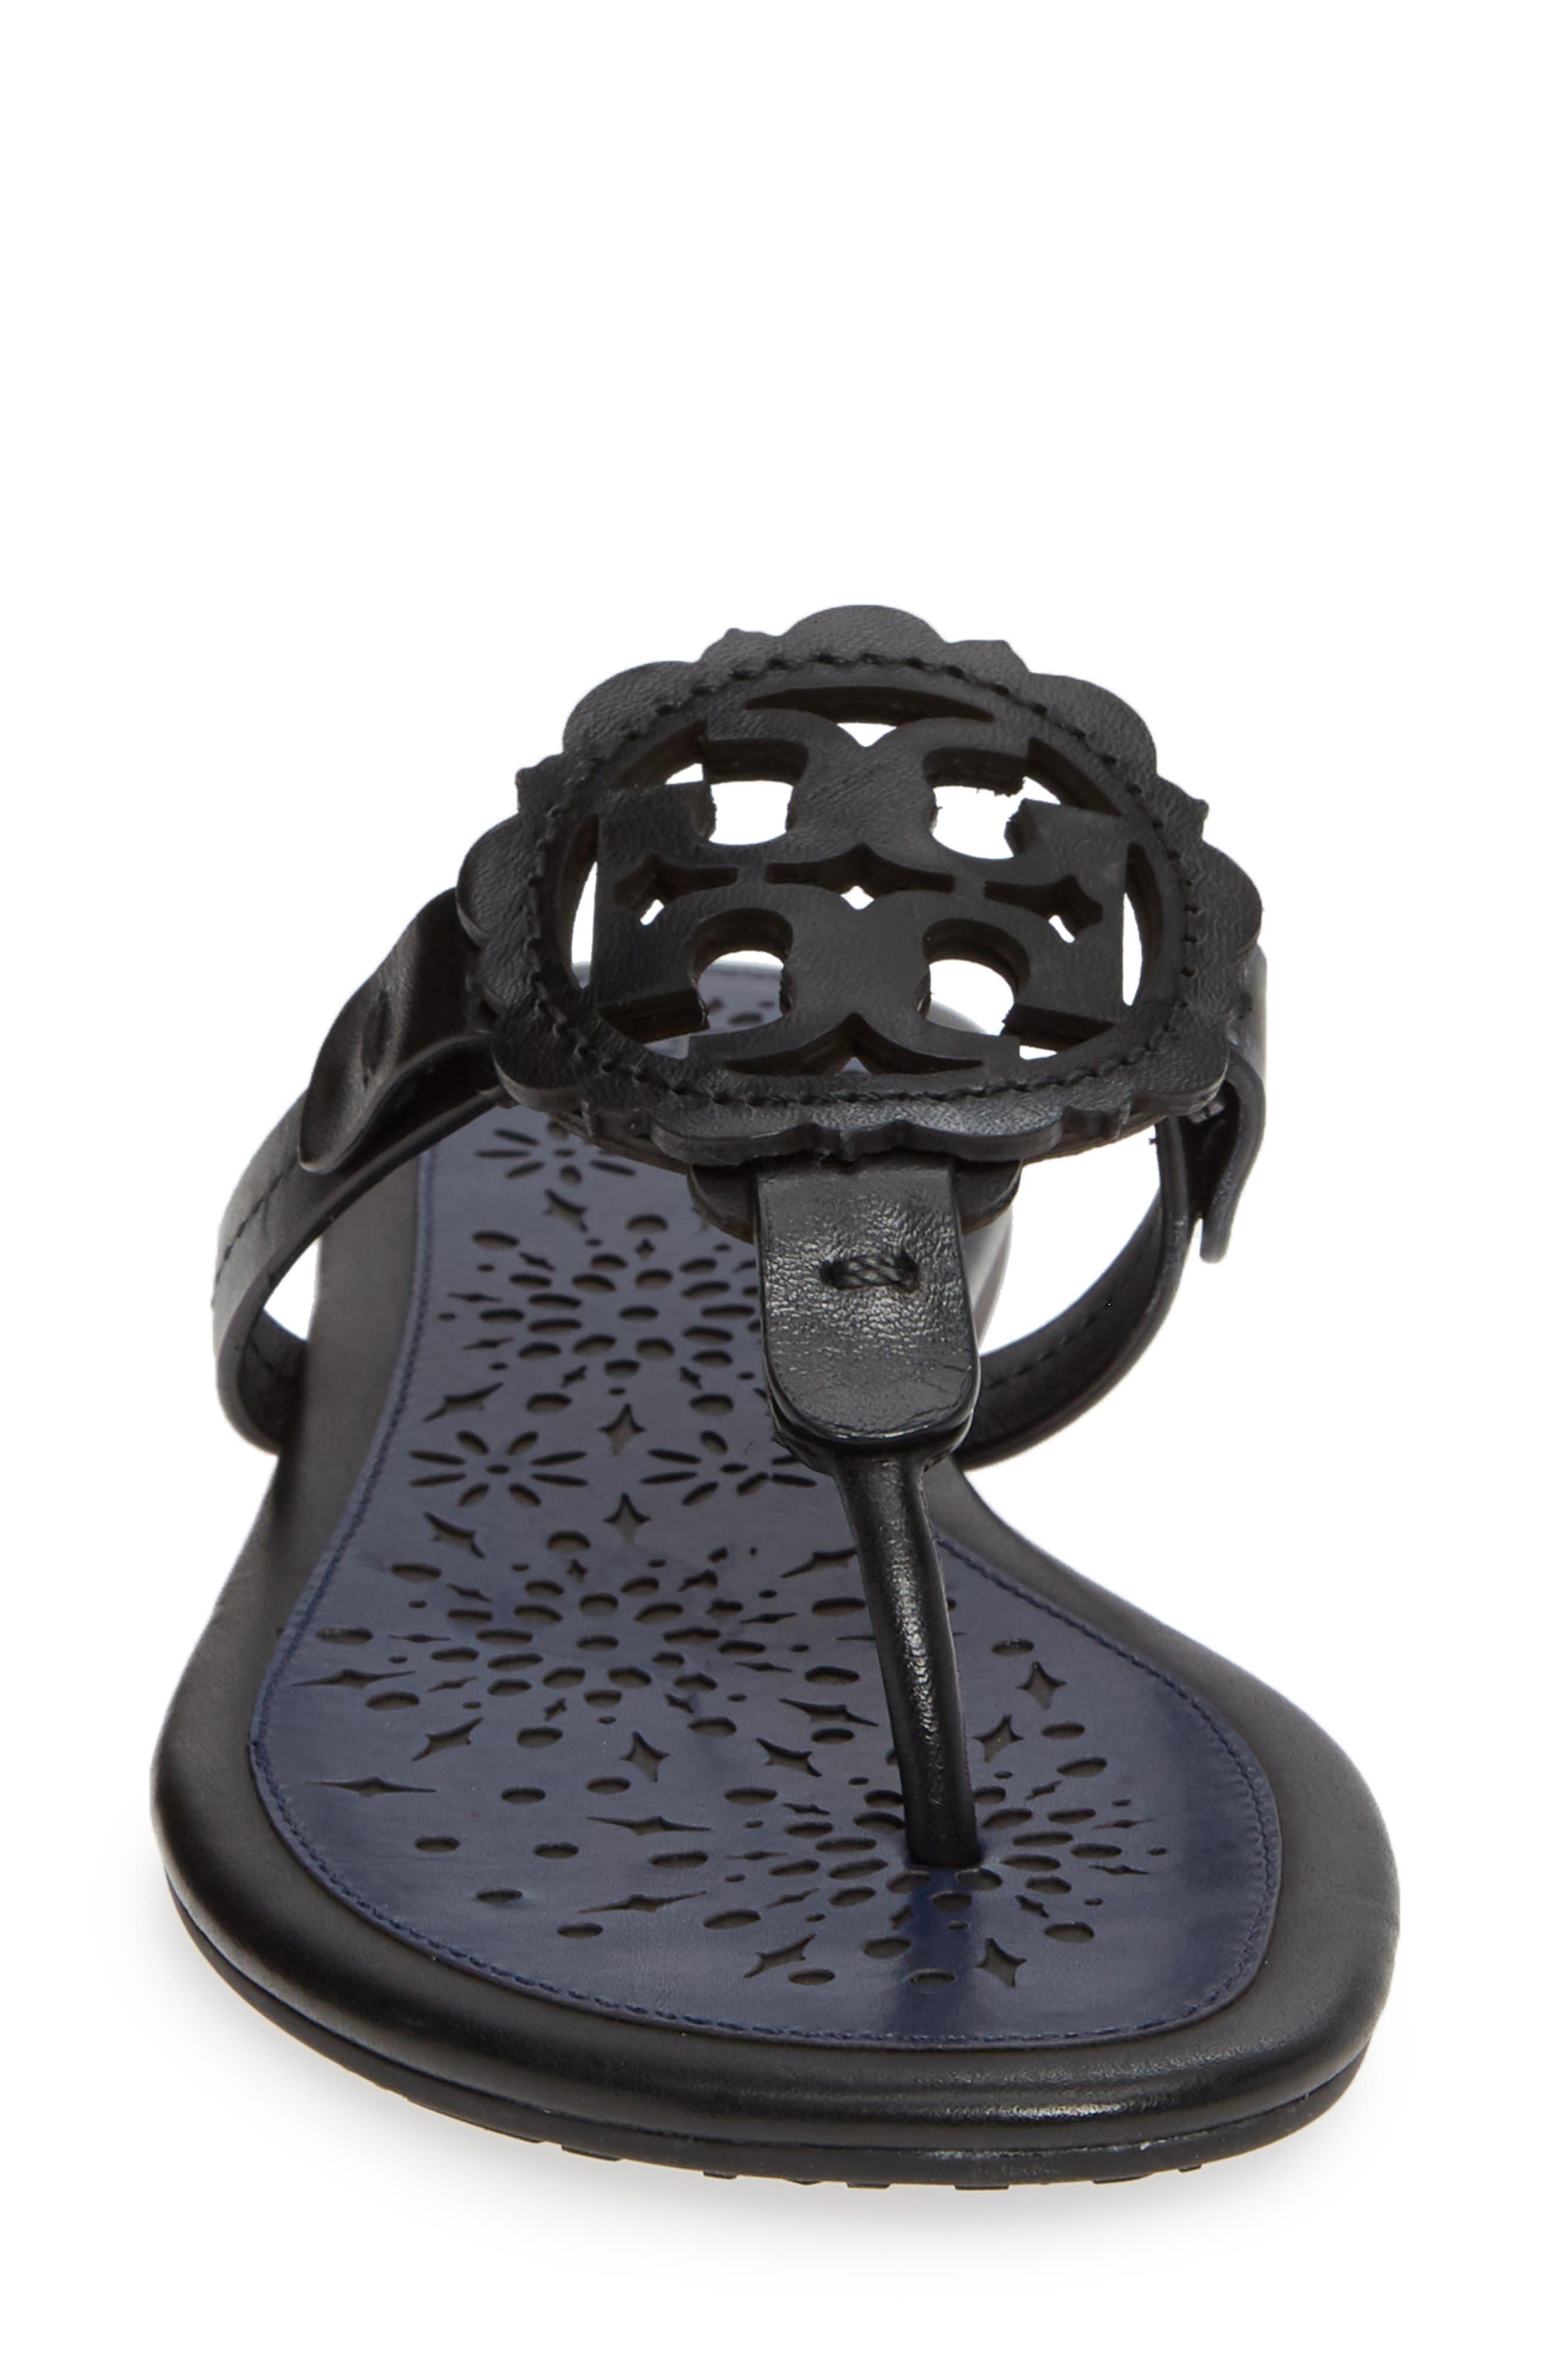 Miller Scalloped Medallion Sandal,                             Alternate thumbnail 4, color,                             PERFECT BLACK/ PERFECT NAVY